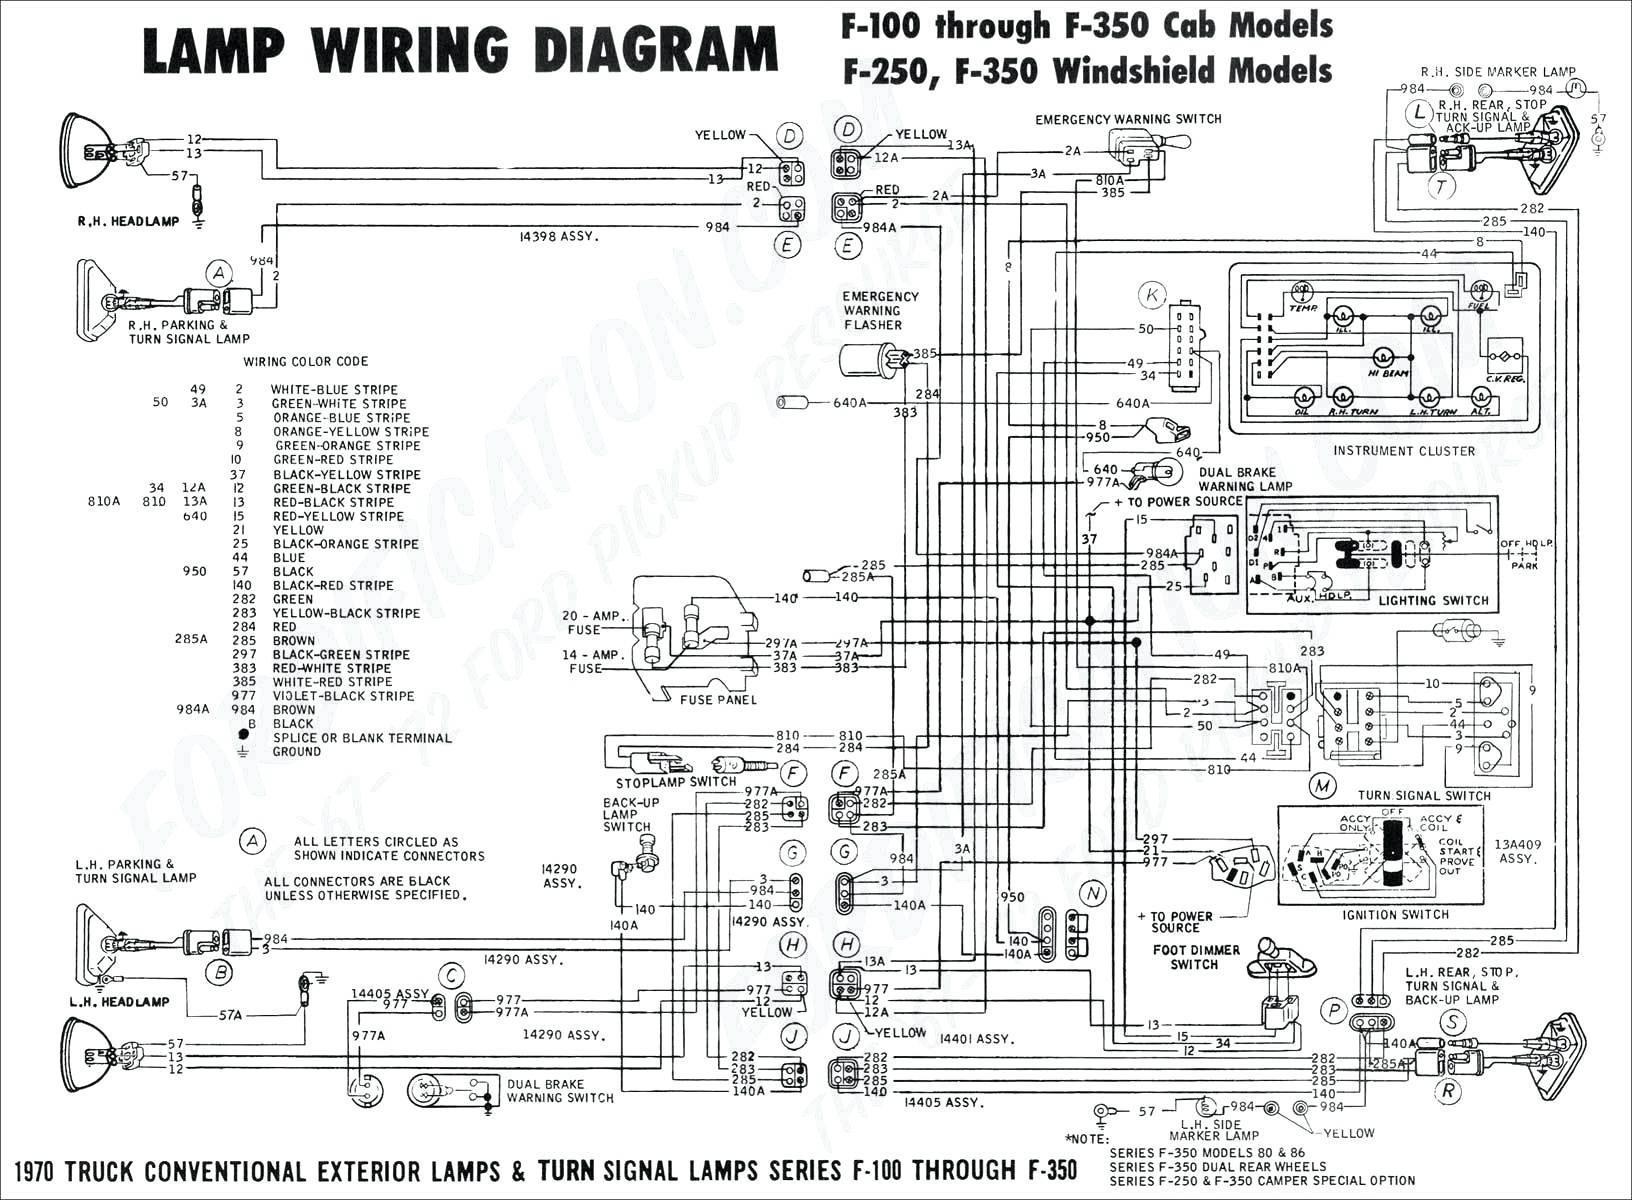 1997 Nissan Pickup Engine Diagram 1997 F700 Wiring Diagram Another Blog About Wiring Diagram • Of 1997 Nissan Pickup Engine Diagram